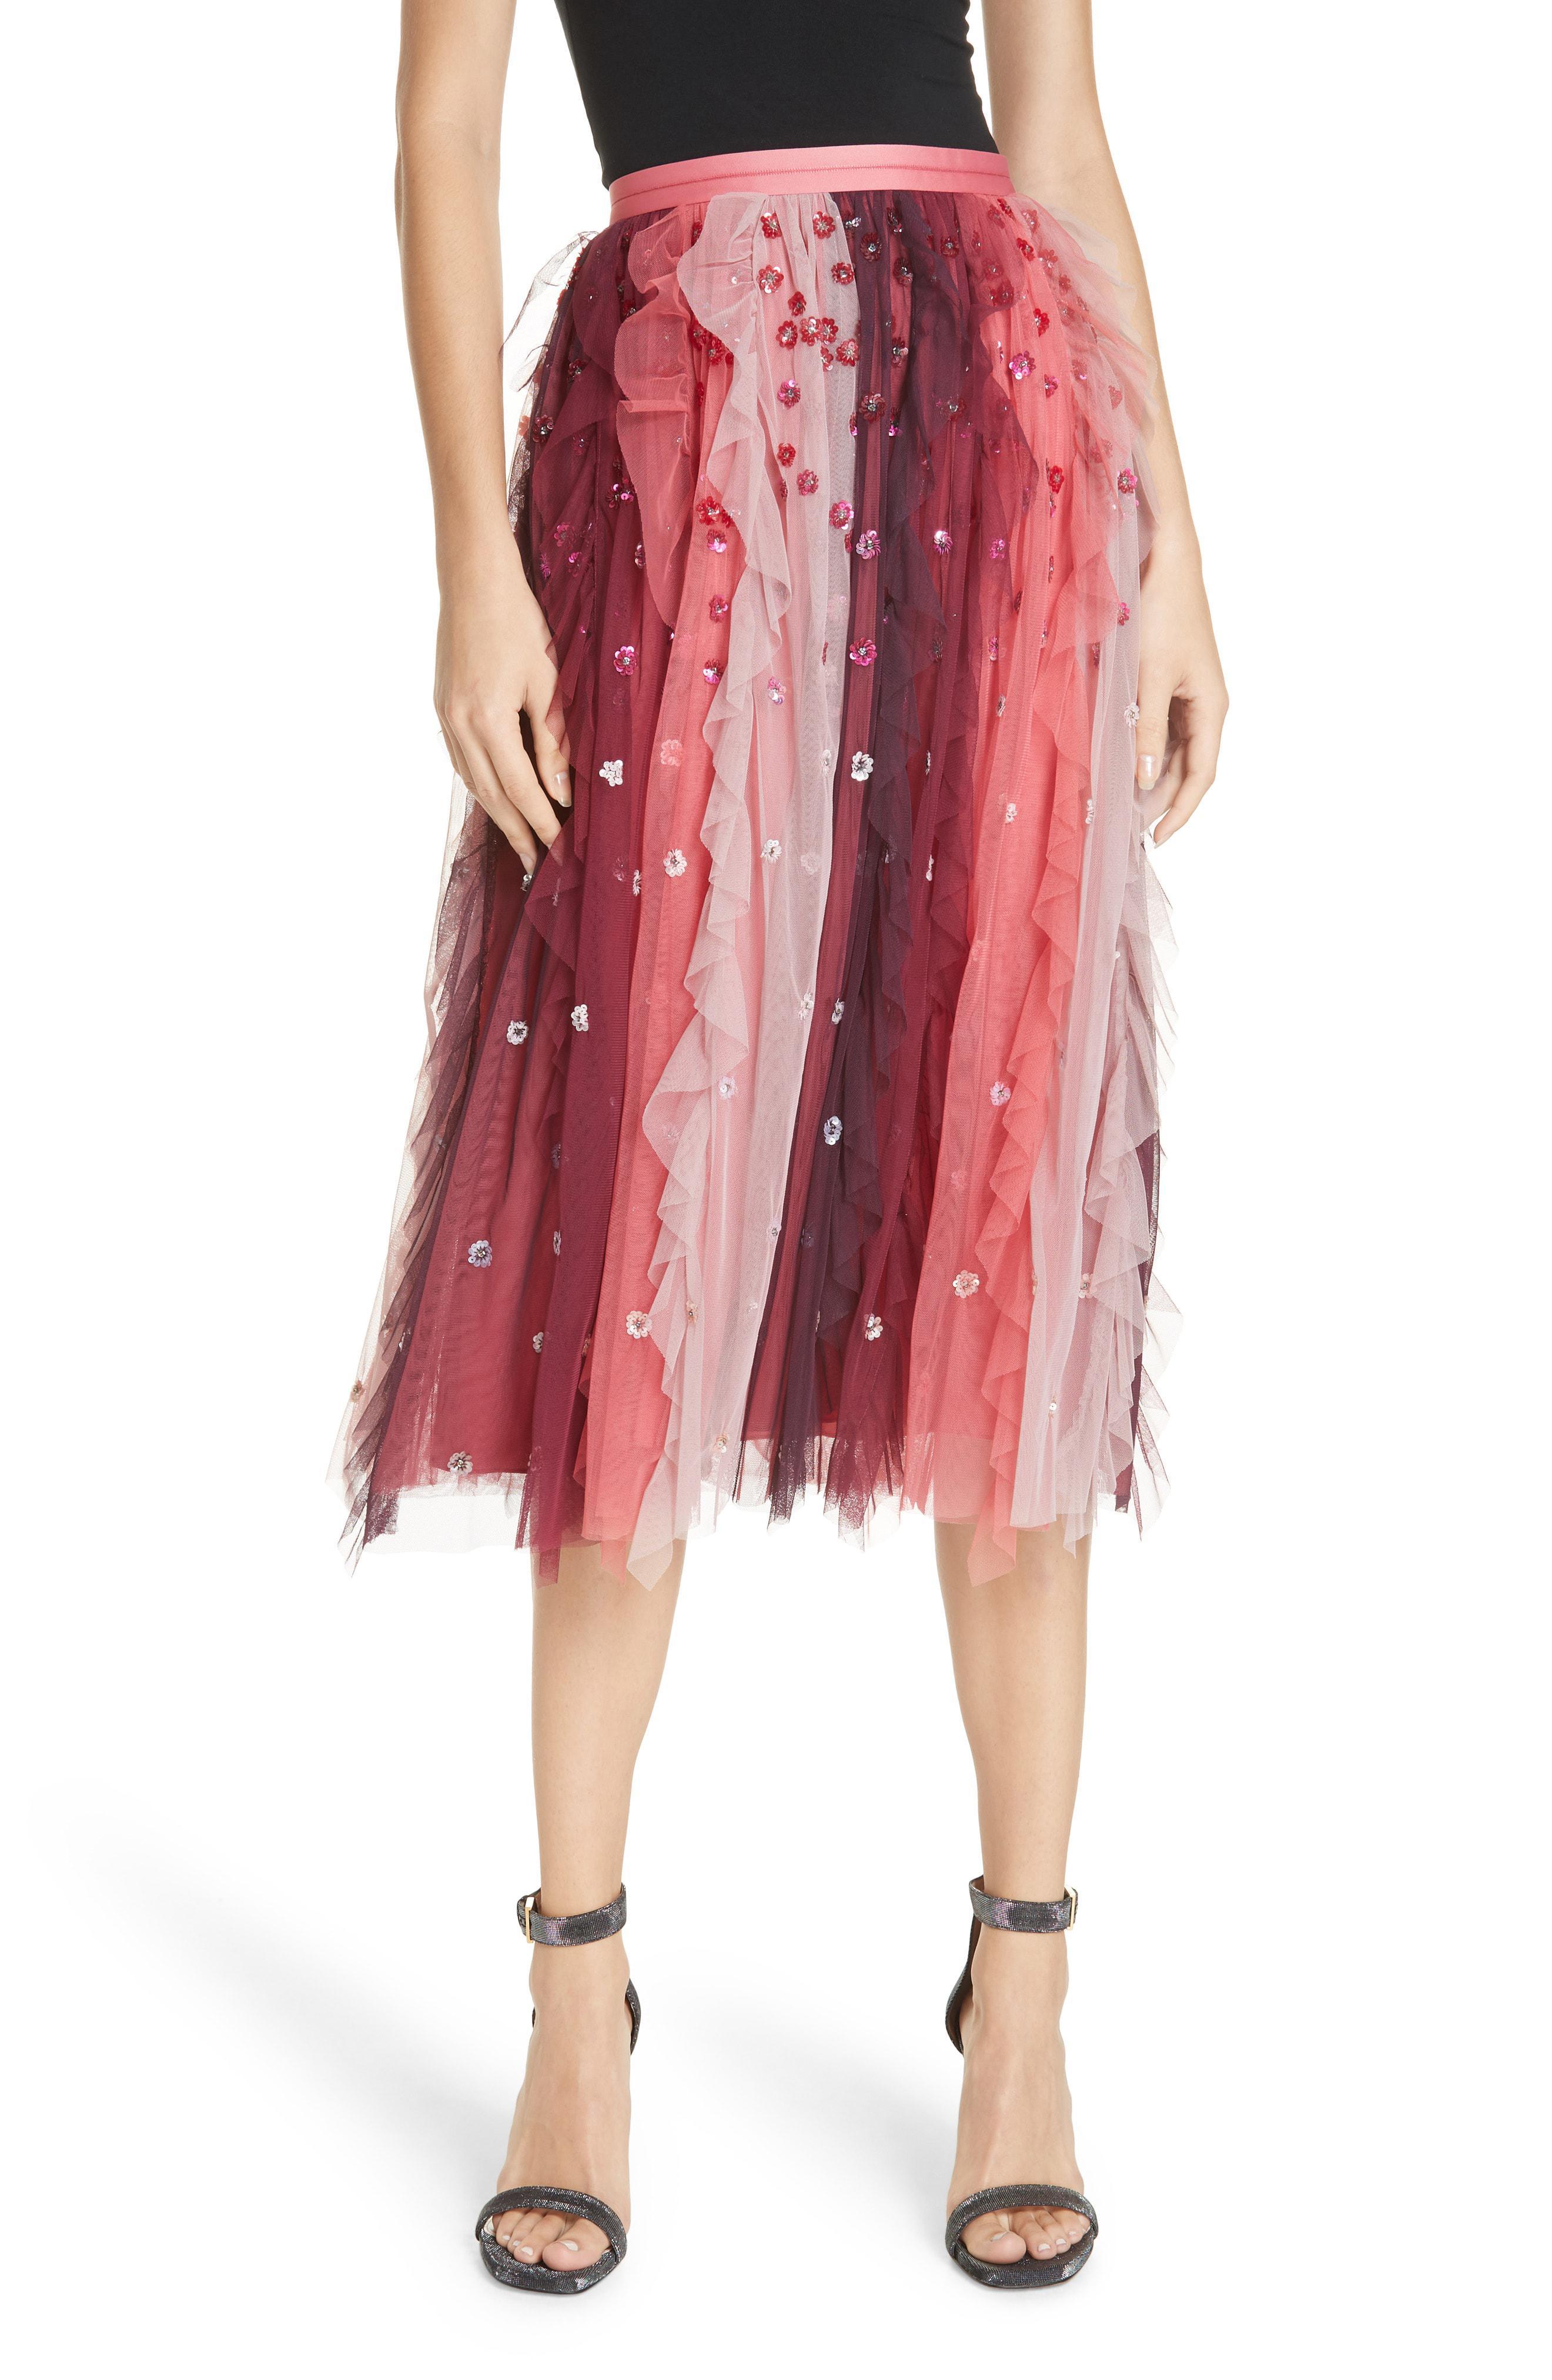 69f40fb56 Lyst - Needle & Thread Rainbow Midi Skirt in Red - Save 65%